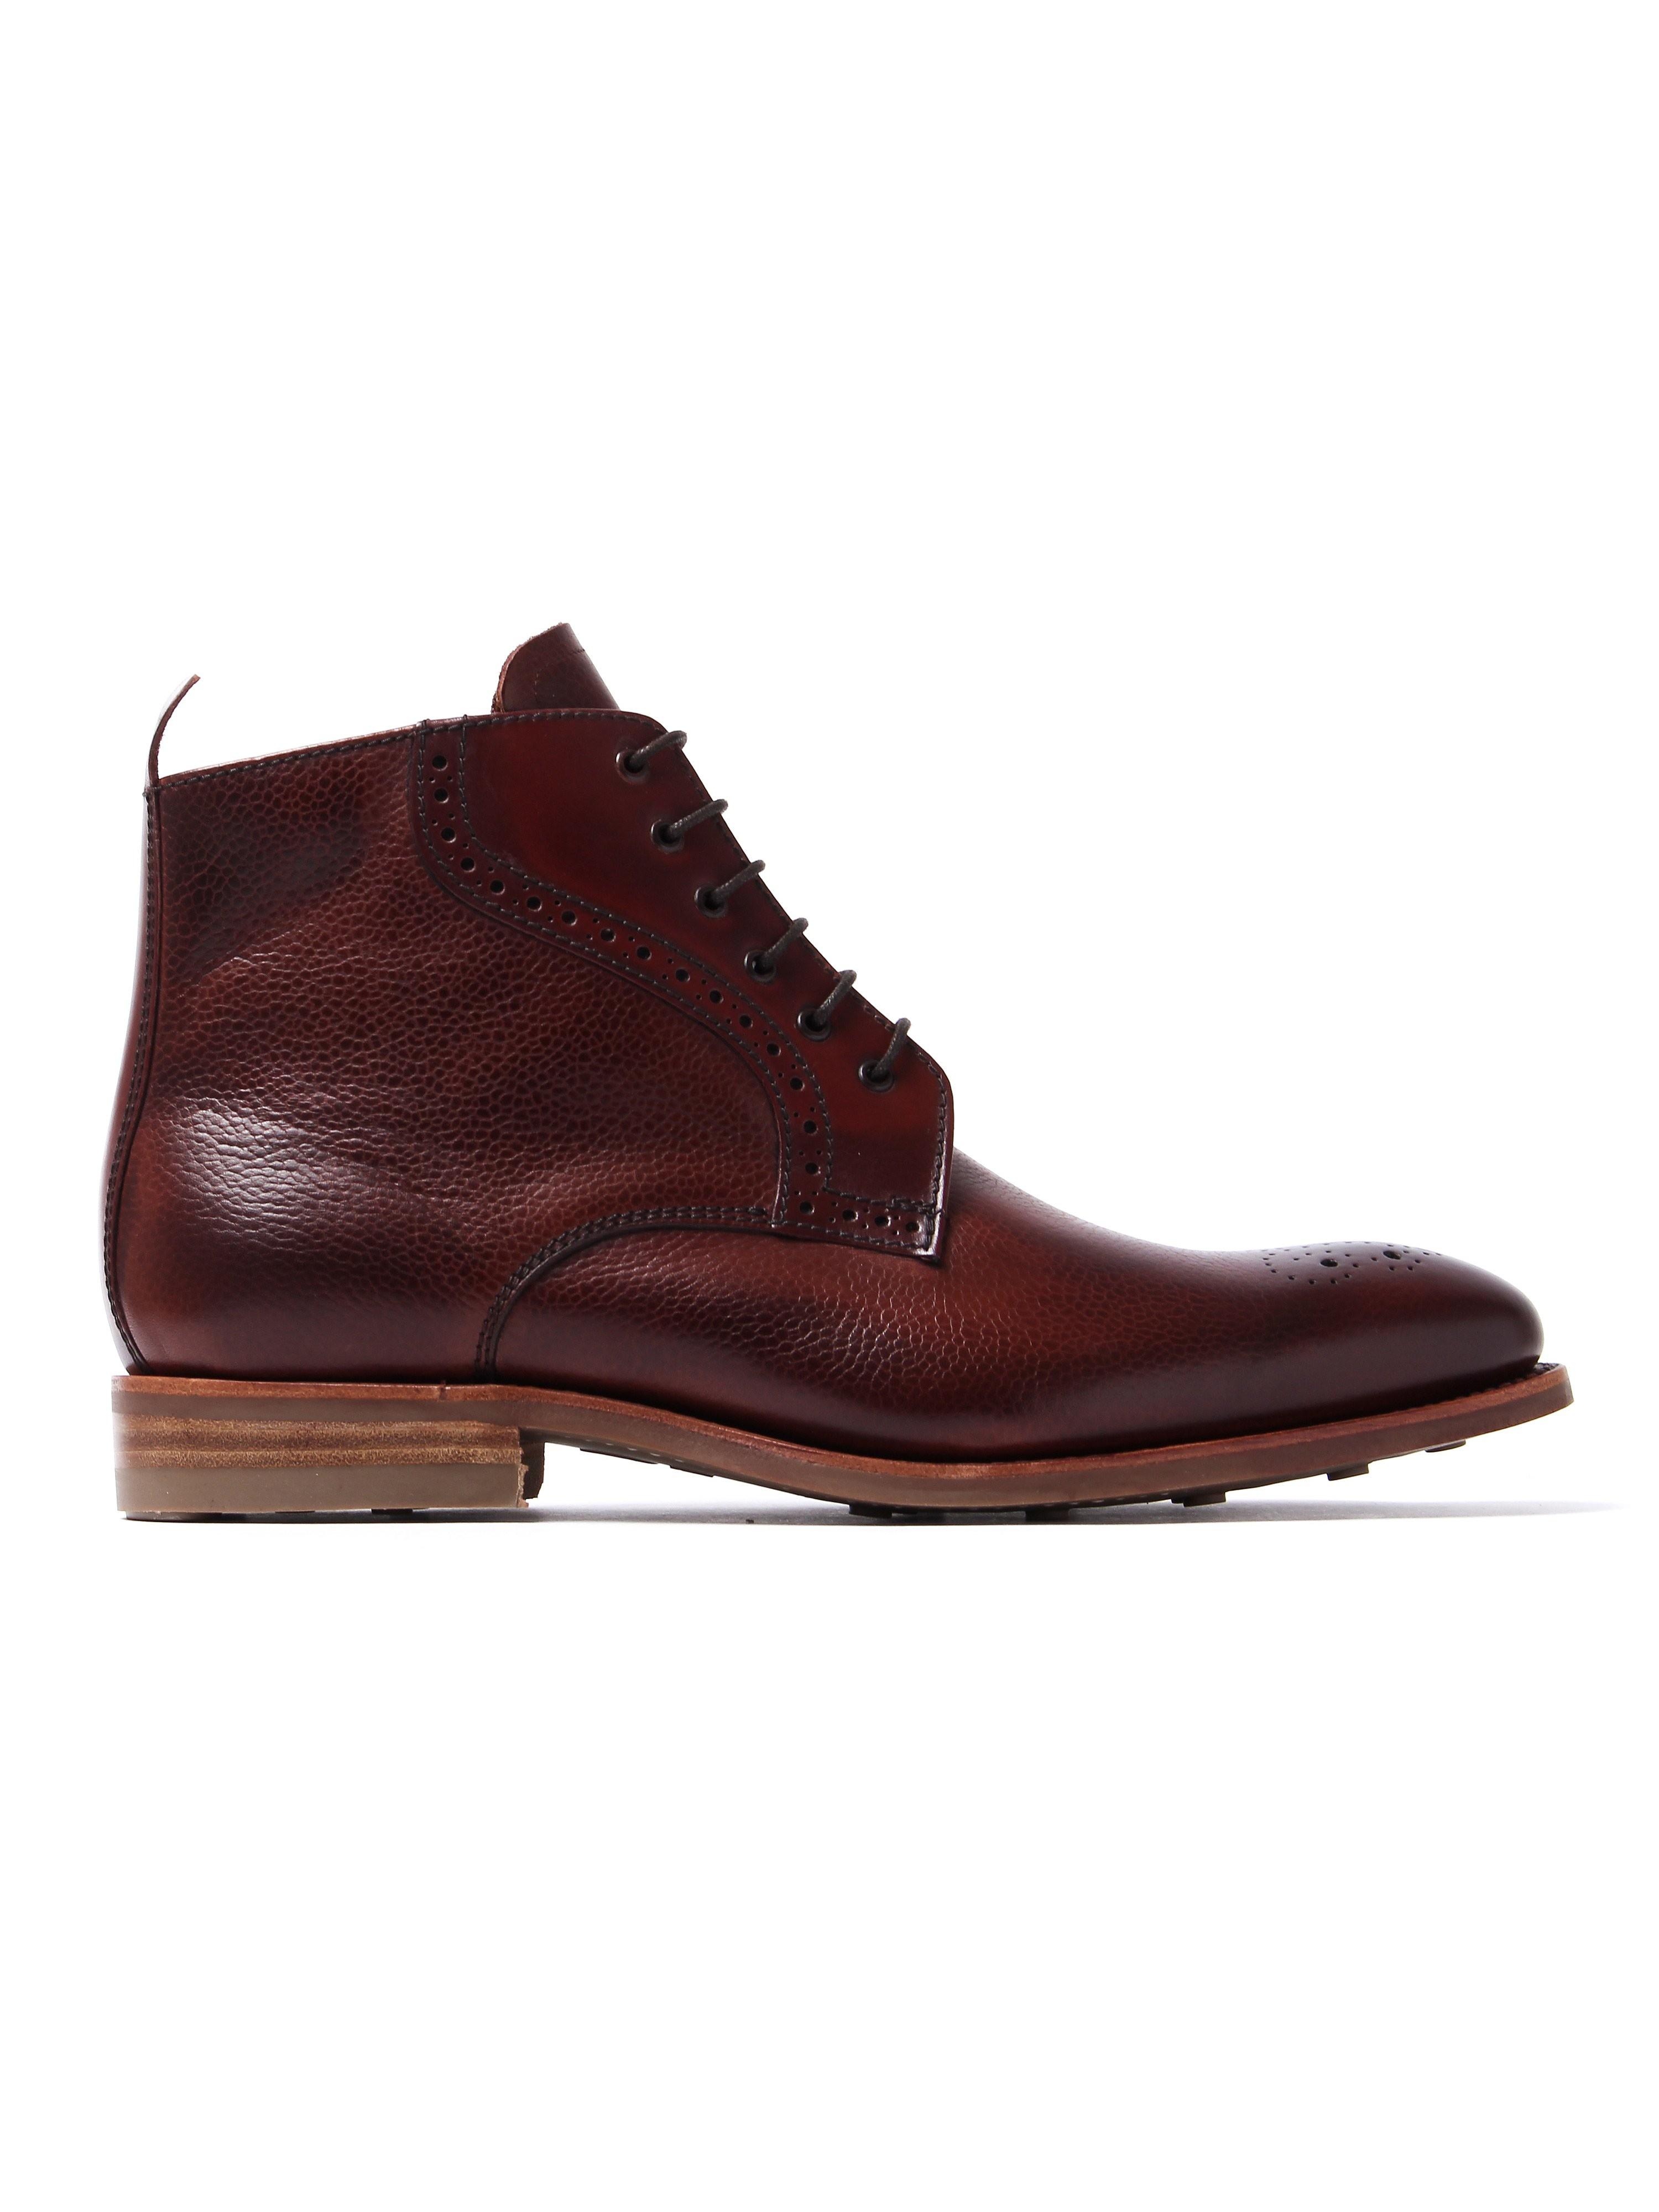 Barker Men's Jude Cedar Grain Boots - Rosewood Leather